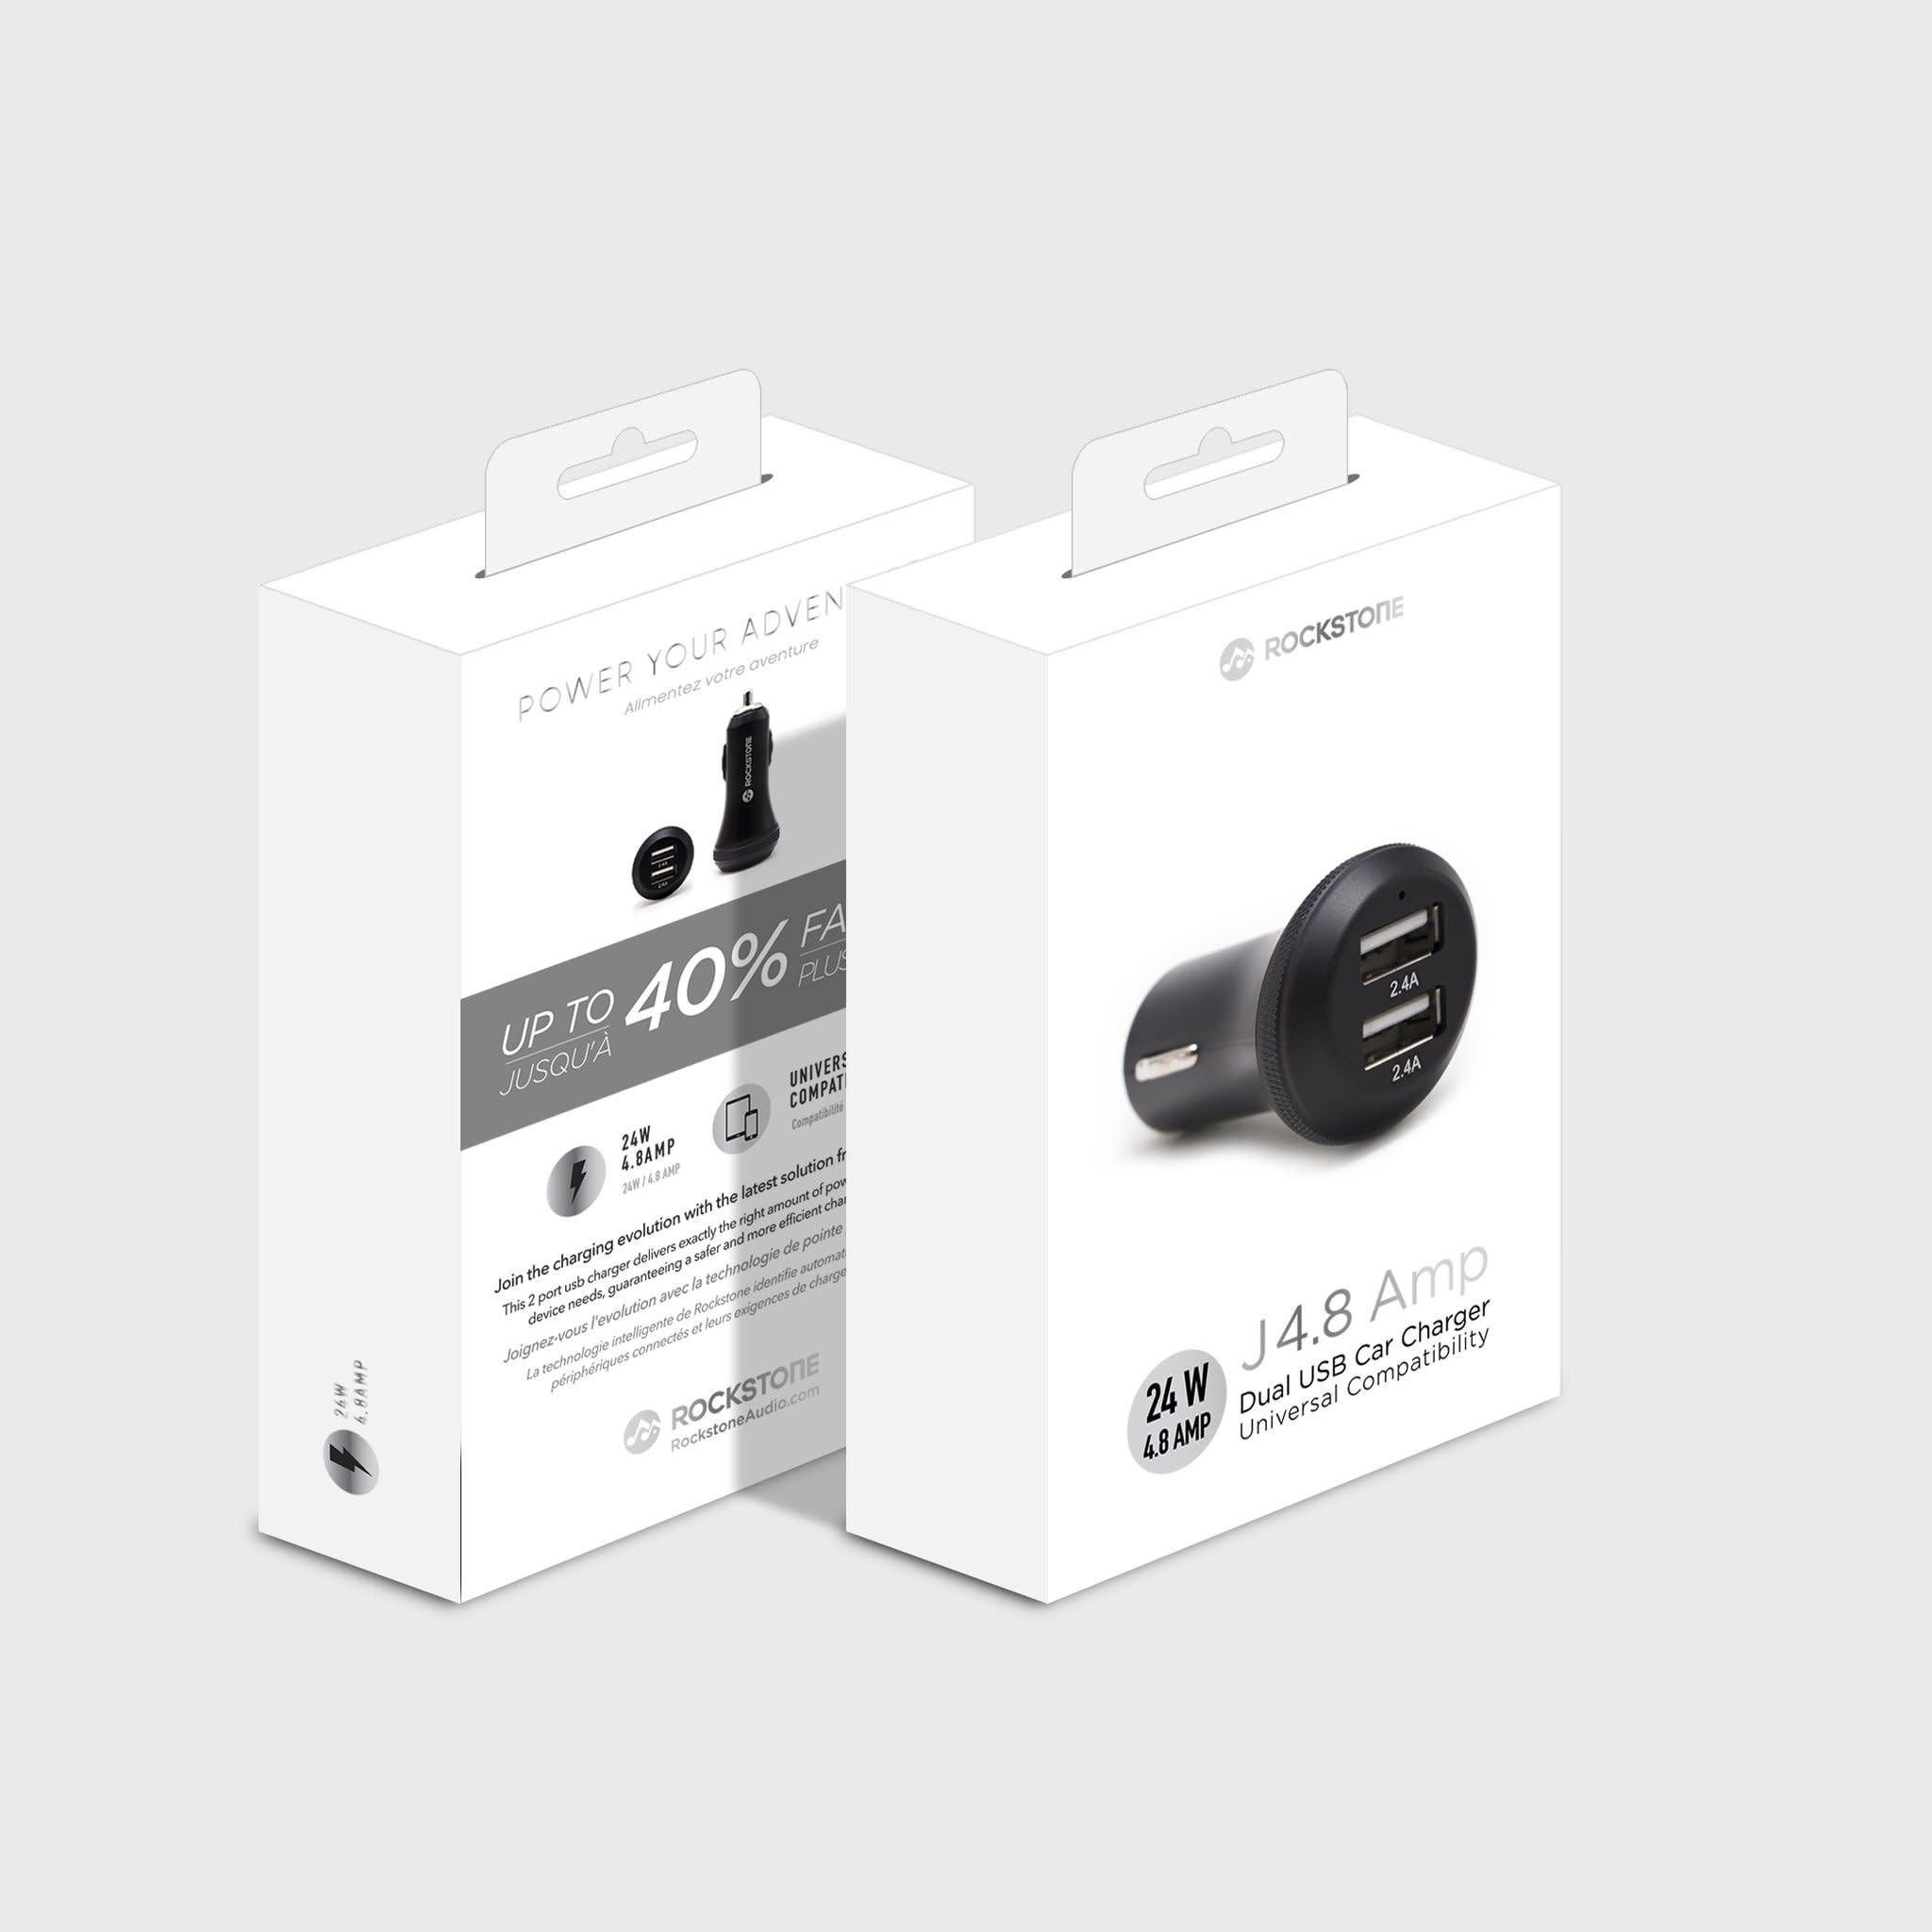 Rockstone Rockstone | J4.8 - 2 Port USB Car Charger - 4.8 AMP RS-J4.8-BK